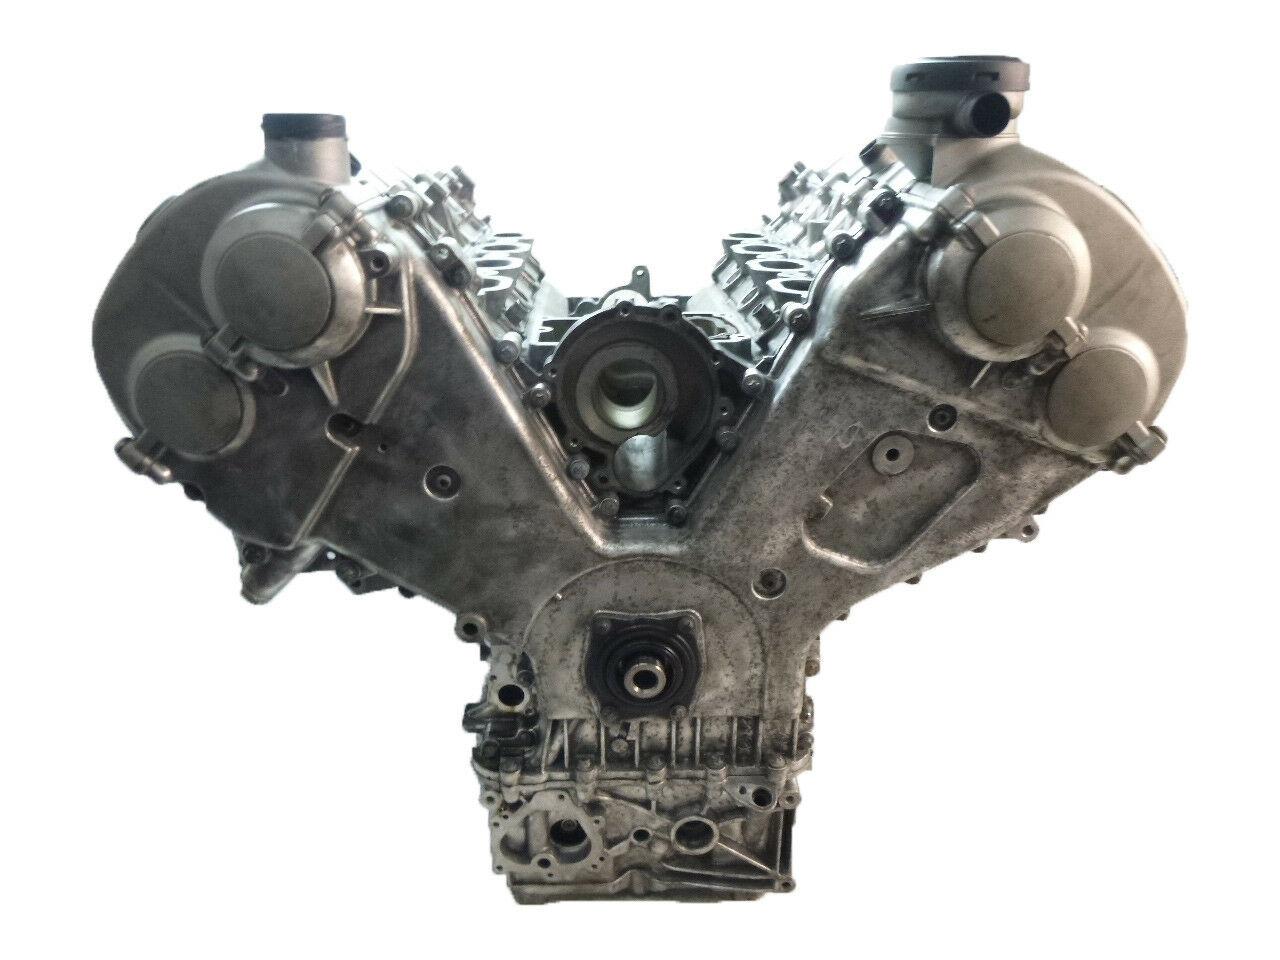 Motor Überholung Instandsetzung Reparatur Porsche Cayenne 4,5 Turbo M48.50 48.50